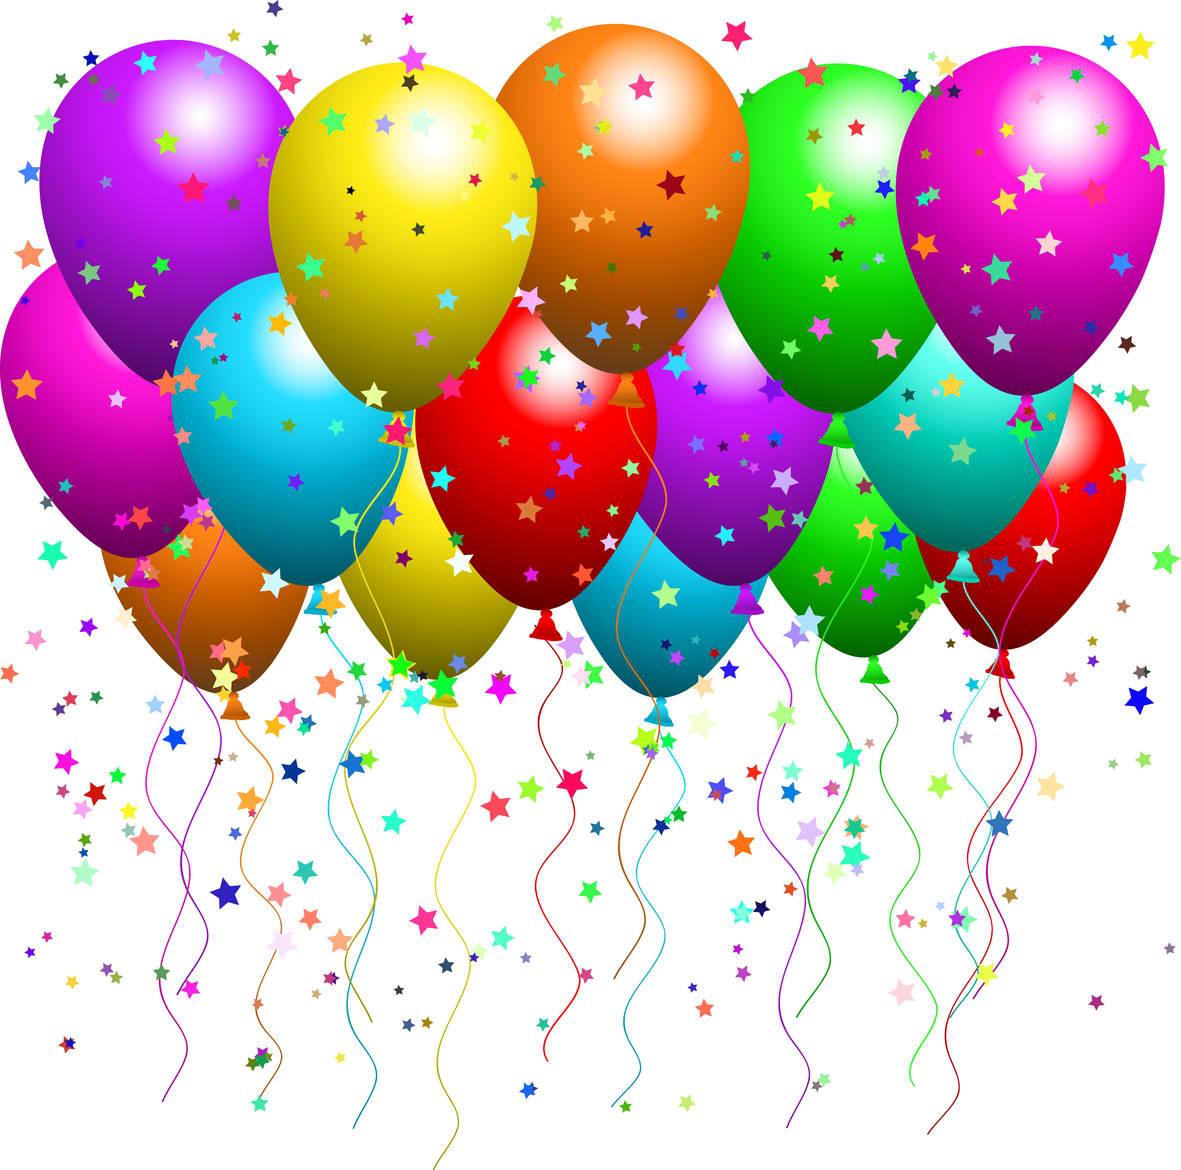 Birthday balloons free birthday clipart -Birthday balloons free birthday clipart balloons muuf-8